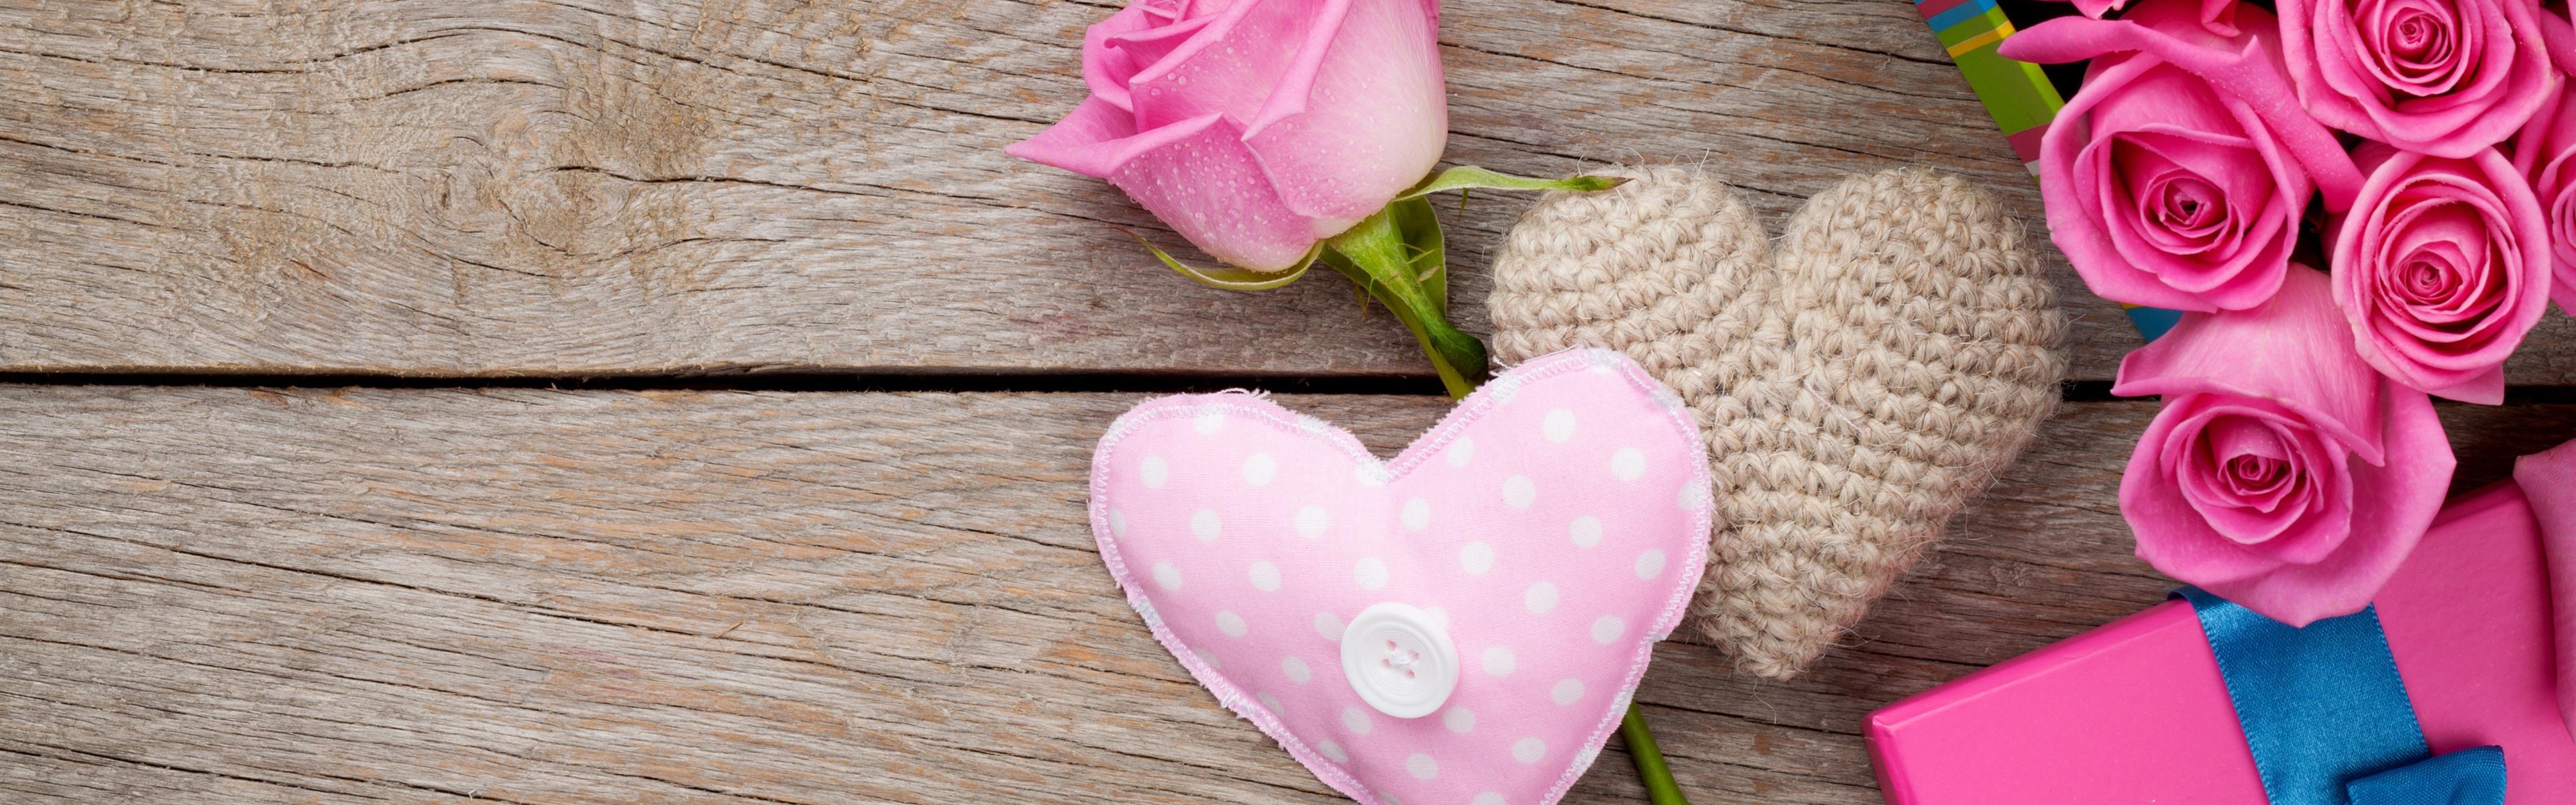 Wallpaper Pink Roses Love Heart Gifts 5120x2880 Uhd 5k